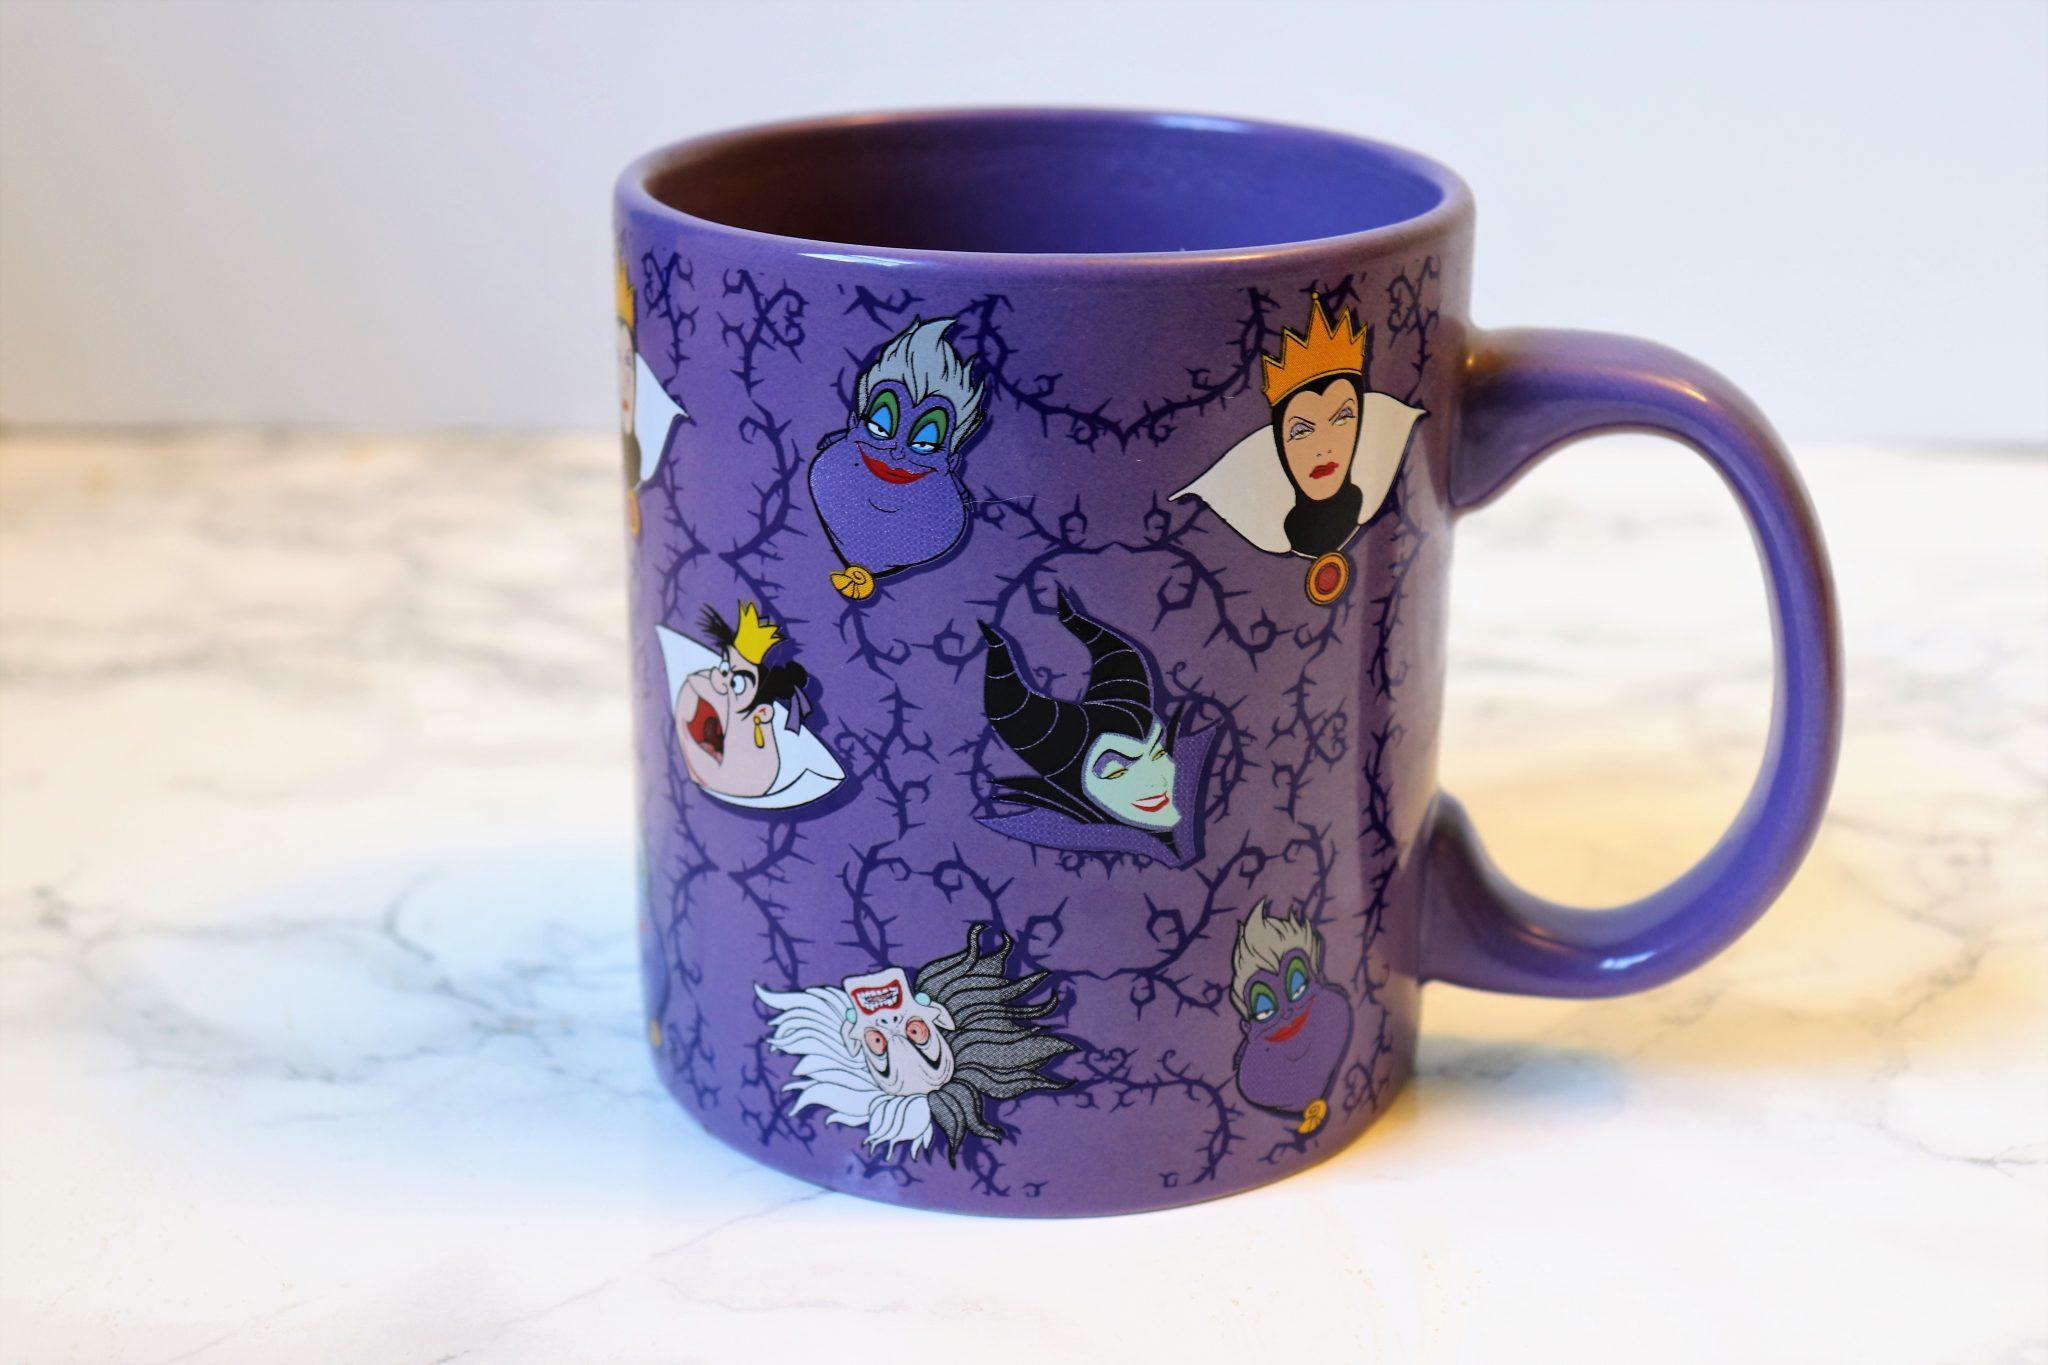 Disney villains mug - Disney in your Day